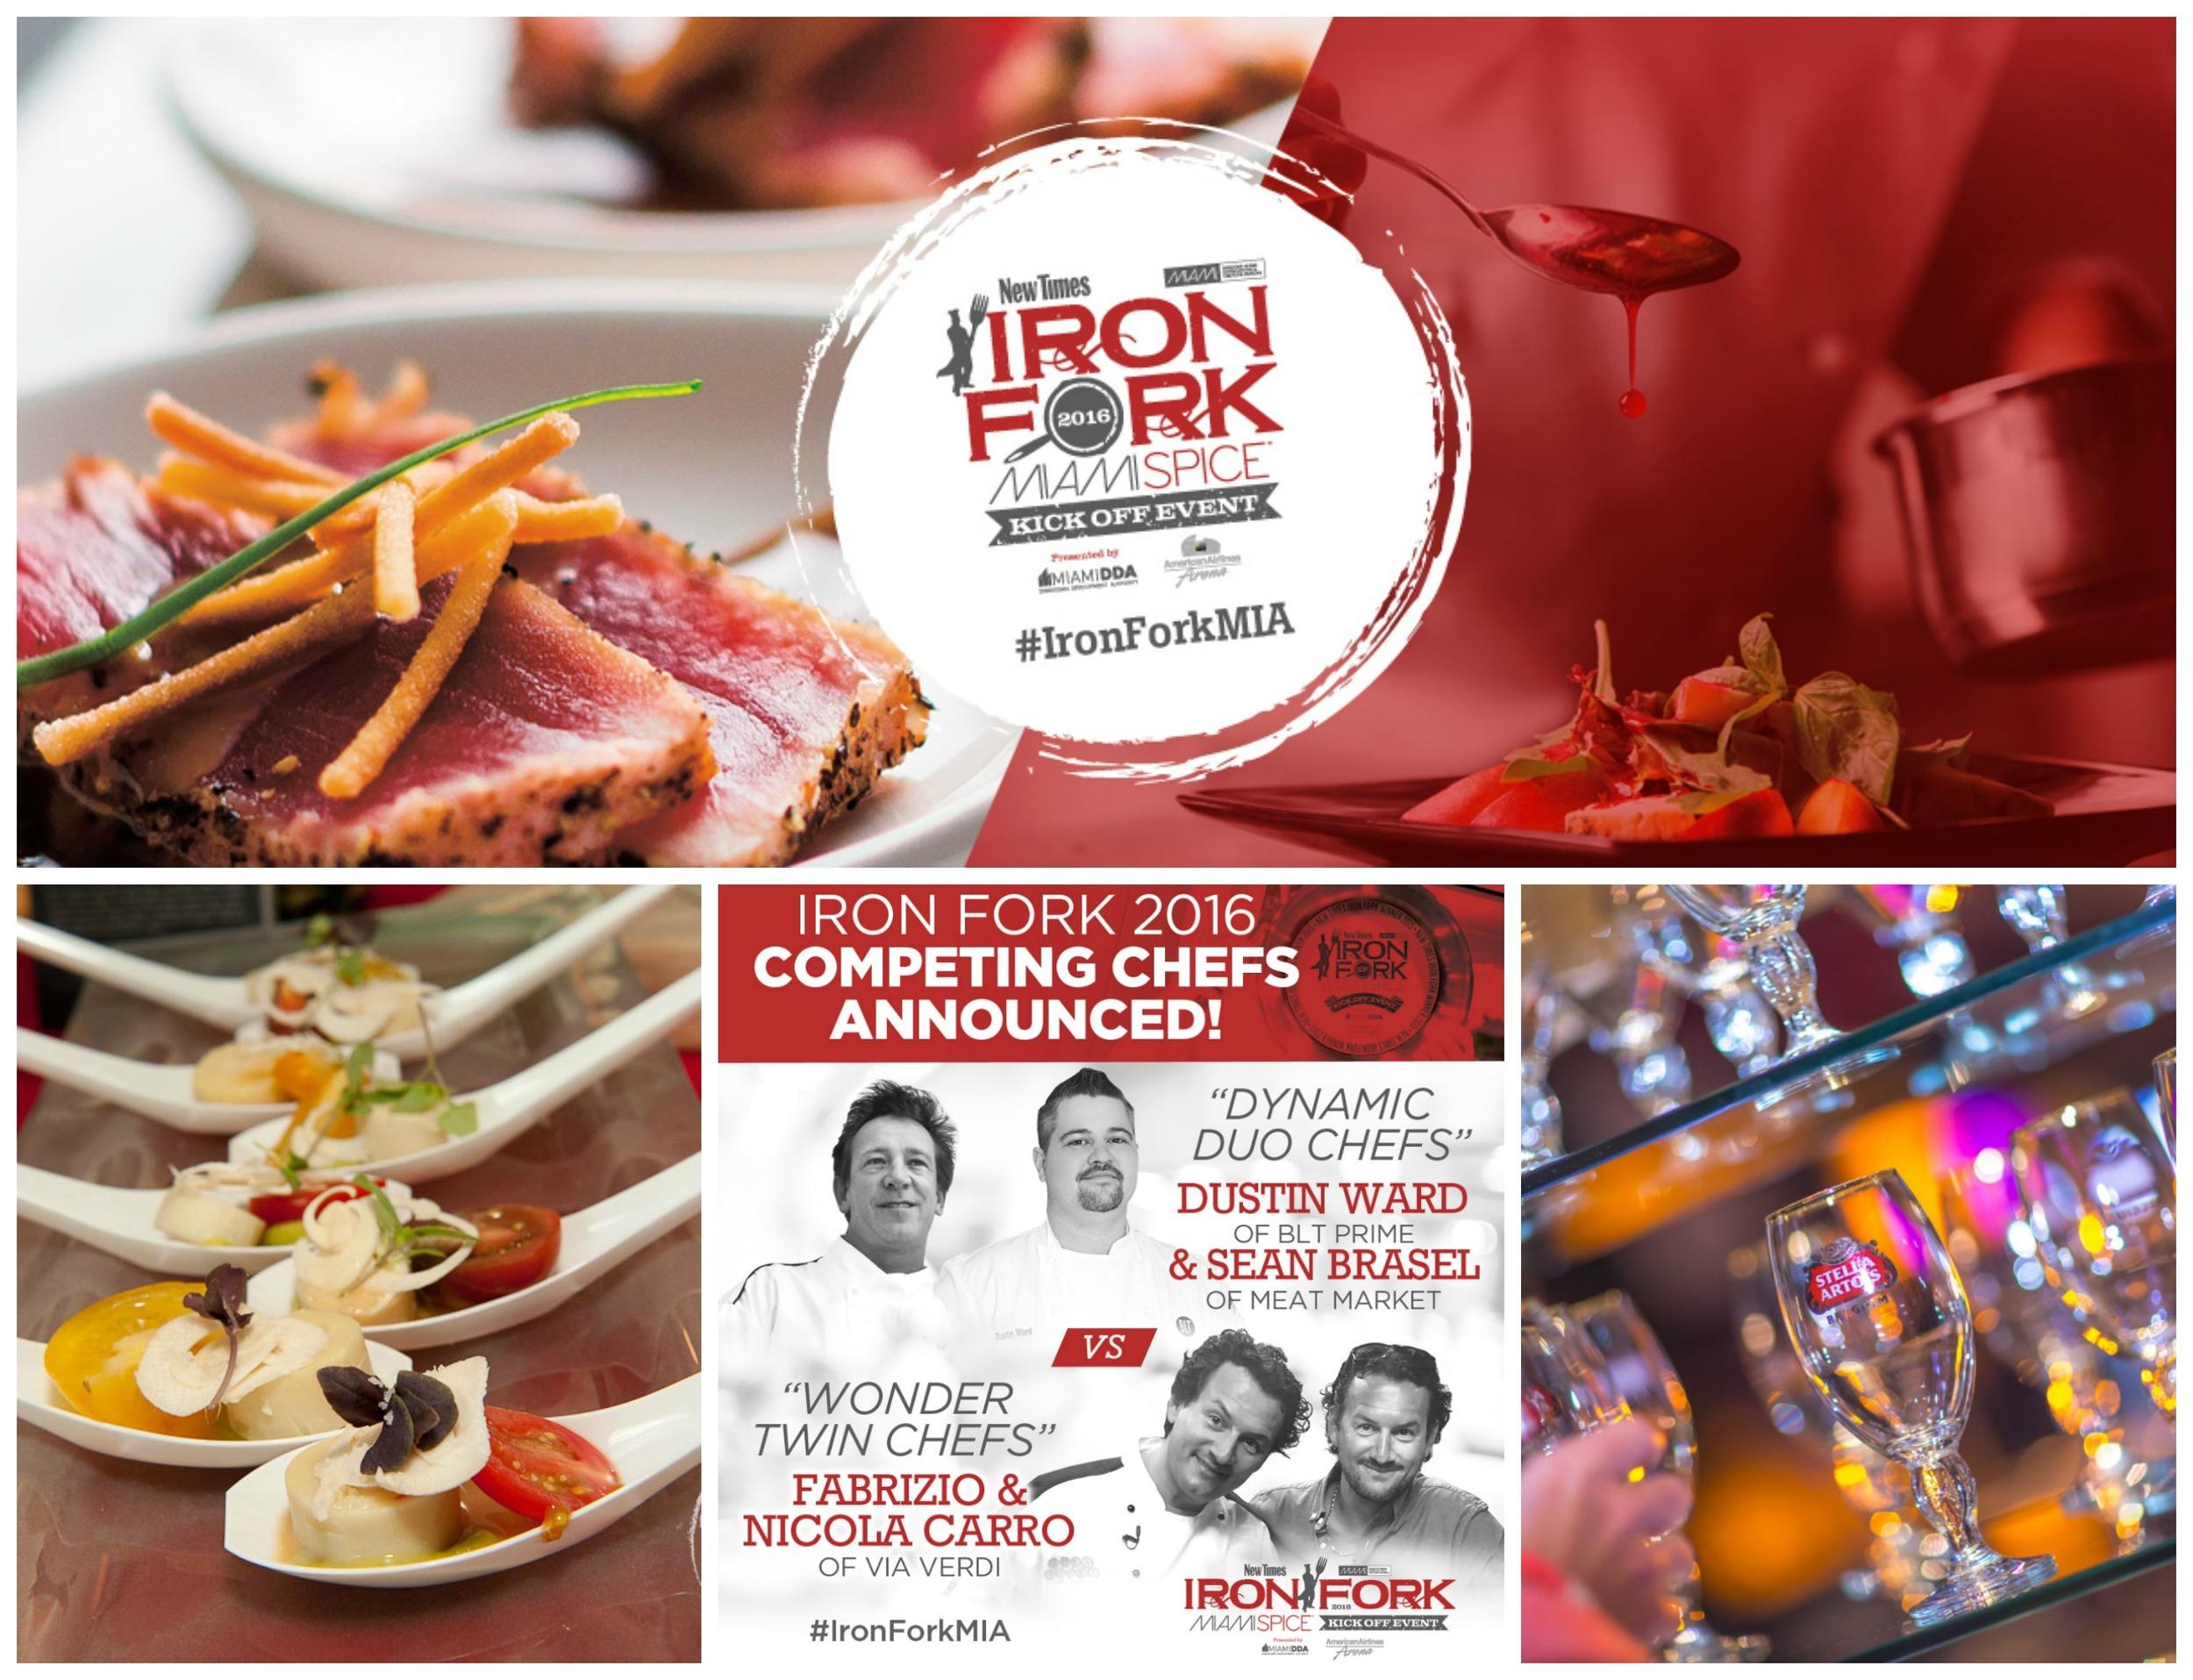 Miami Spice New Times Iron Fork 2016